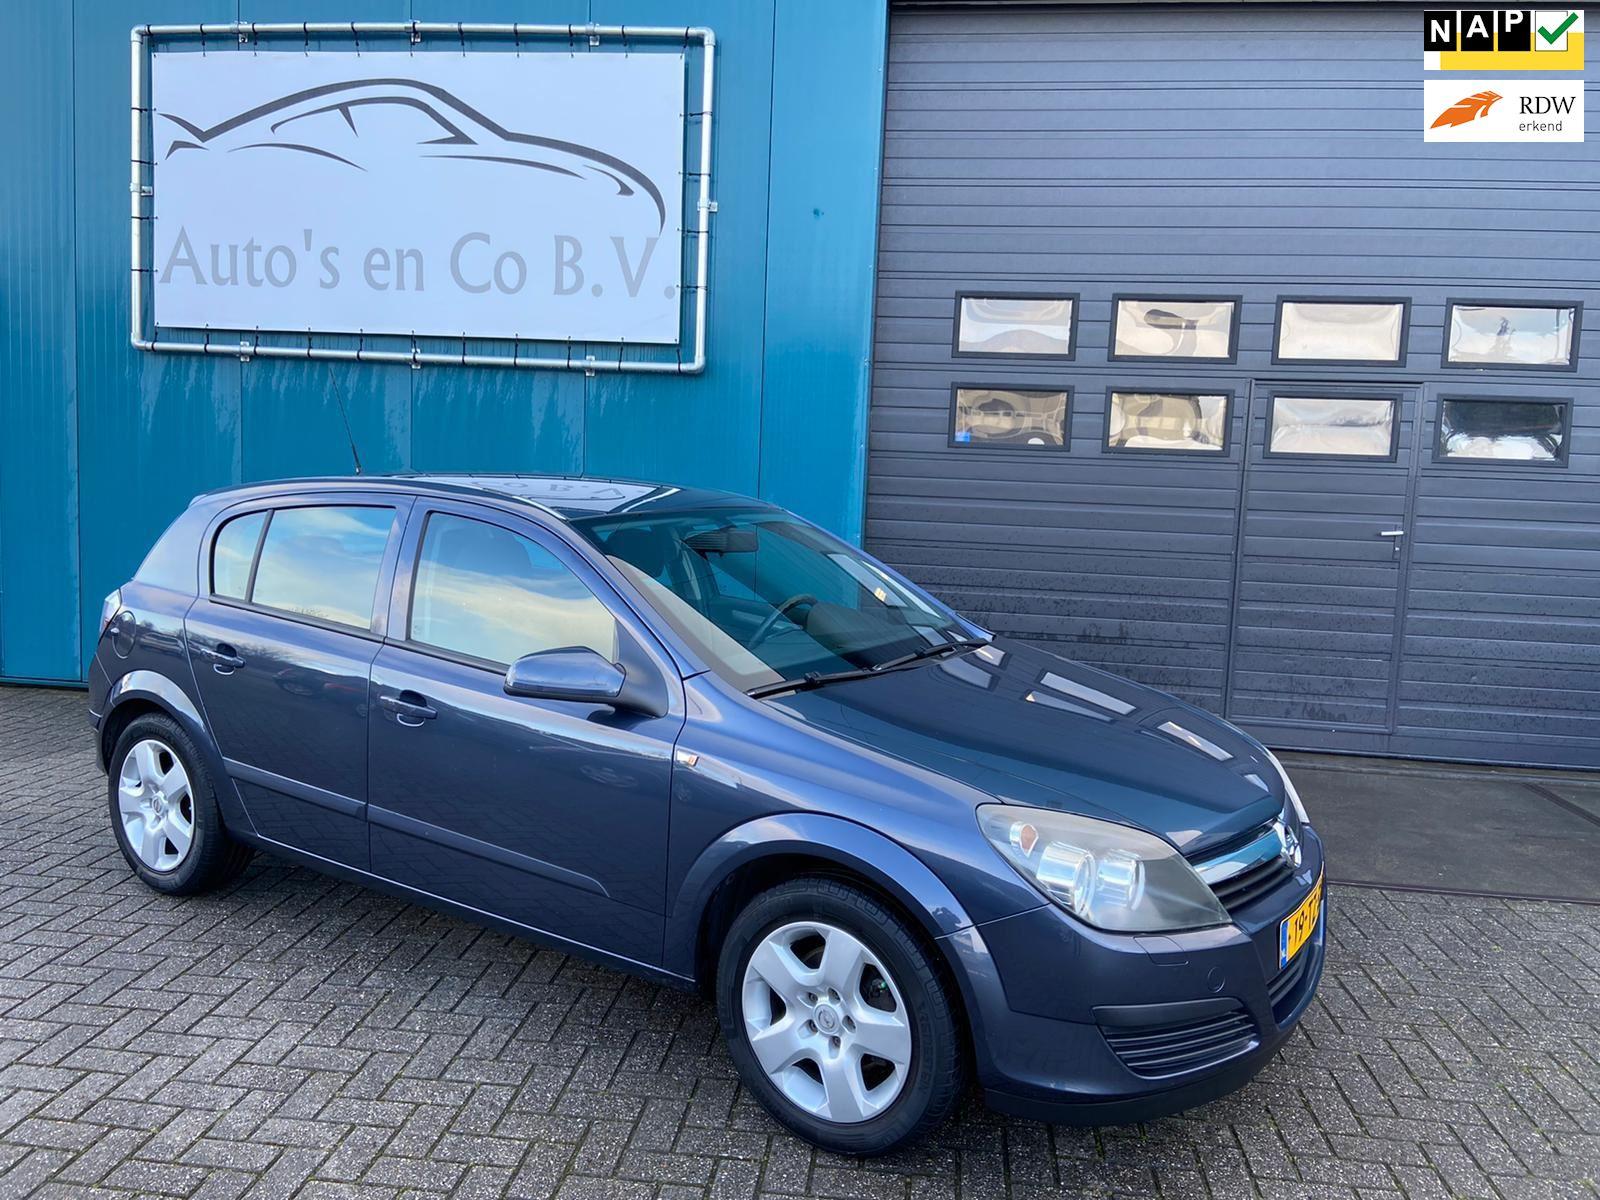 Opel Astra occasion - Auto's en Co B.V.